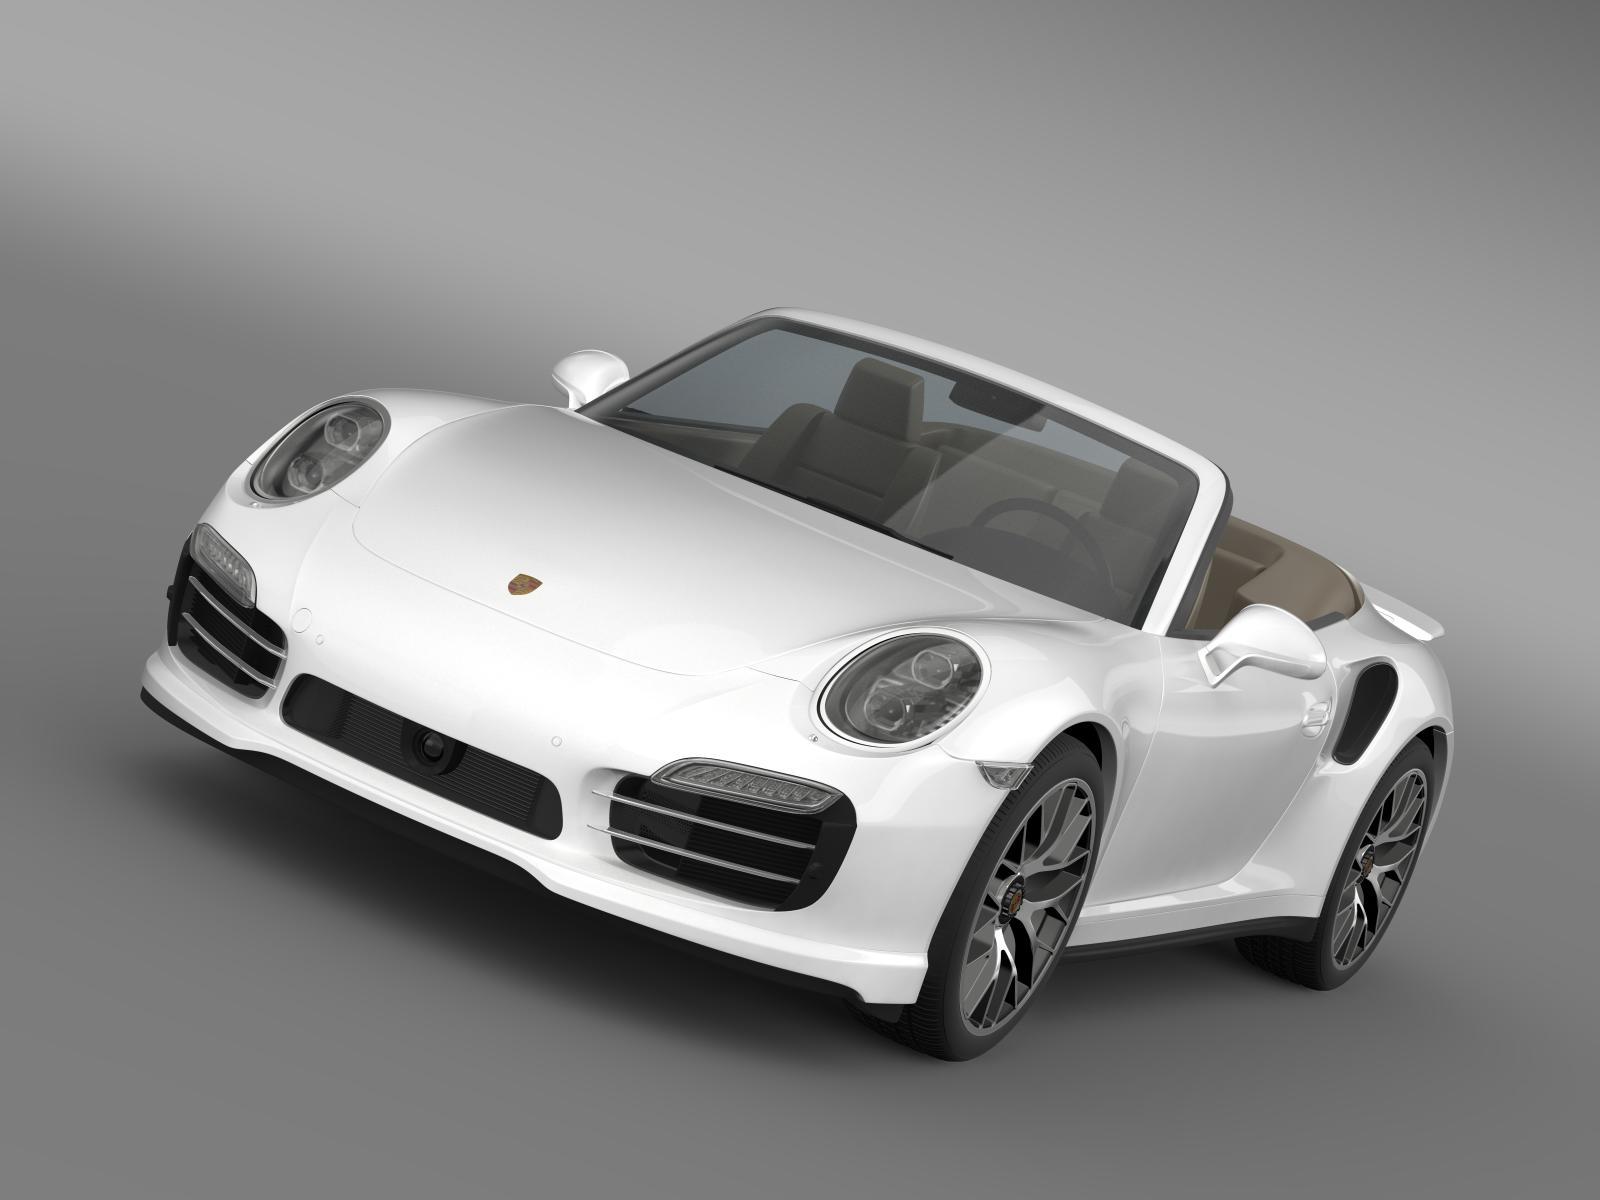 porsche 911 turbo s cabrio 2014 3d model 3ds max fbx c4d lwo ma mb hrc xsi obj 156132